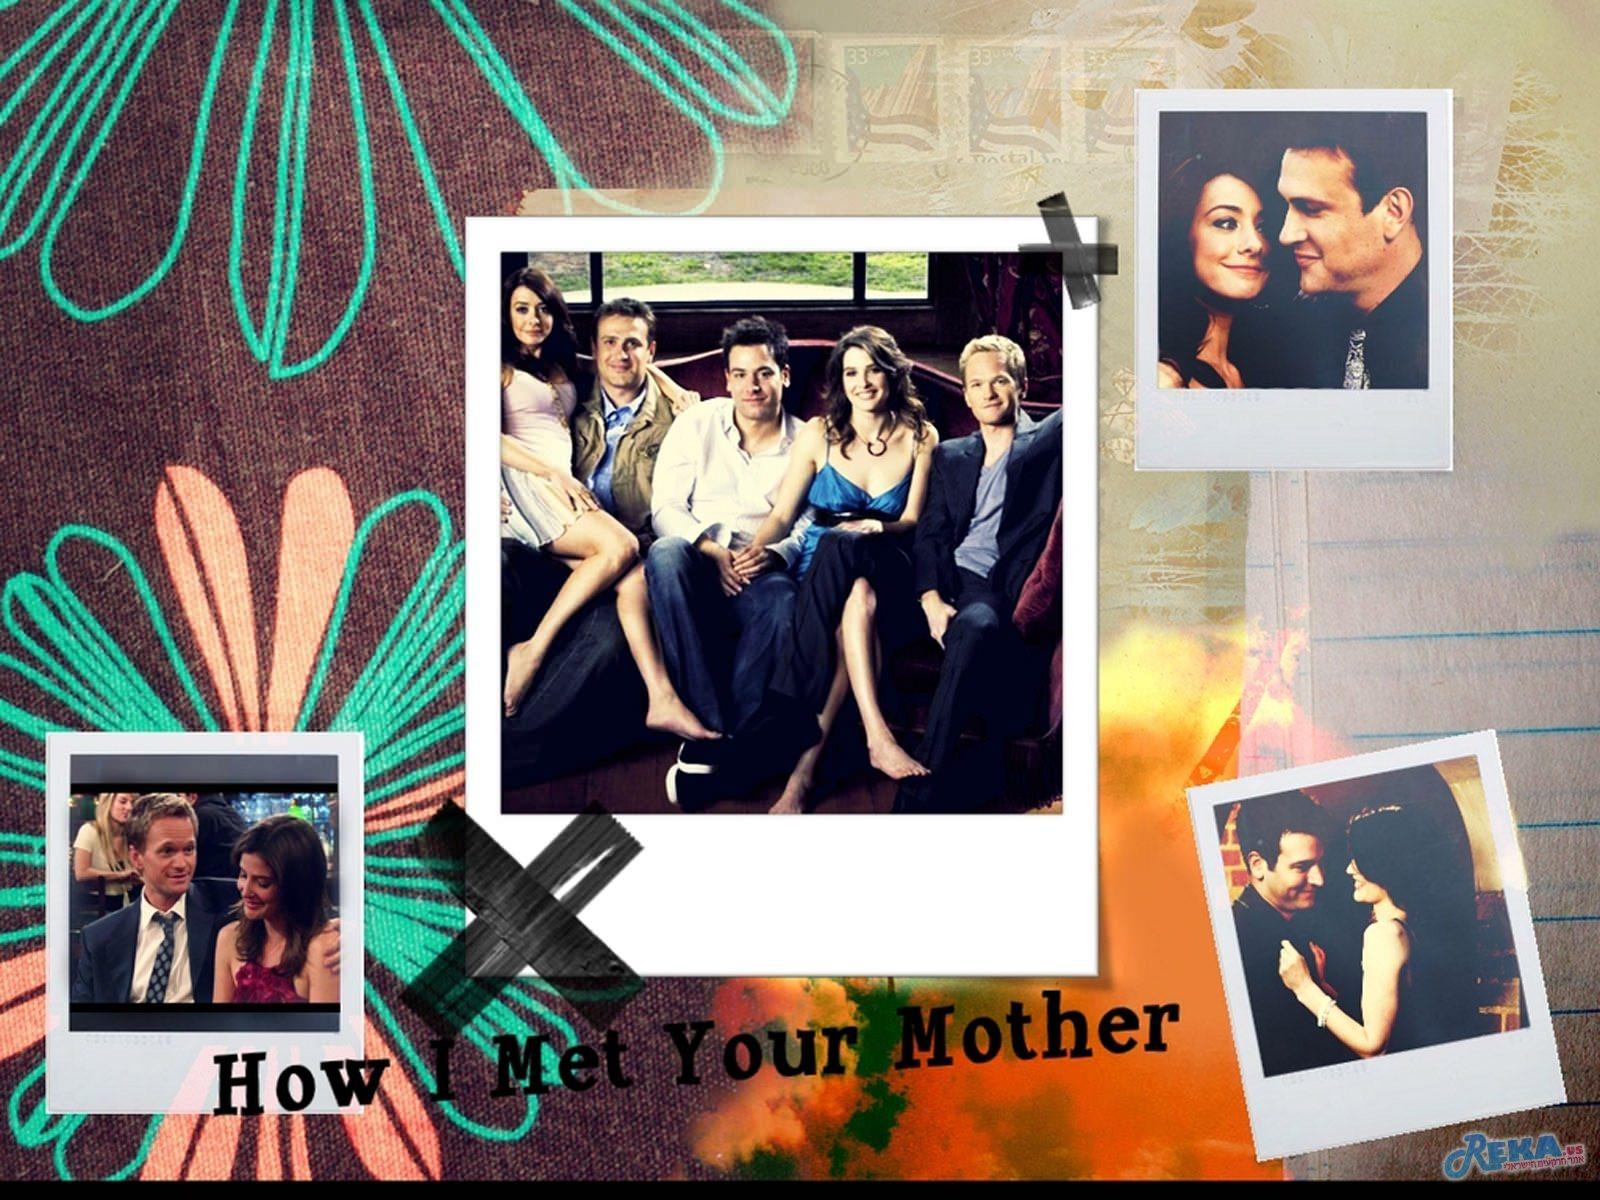 How-I-Met-Your-Mother-how-i-met-your-mother-10317807-1024-768